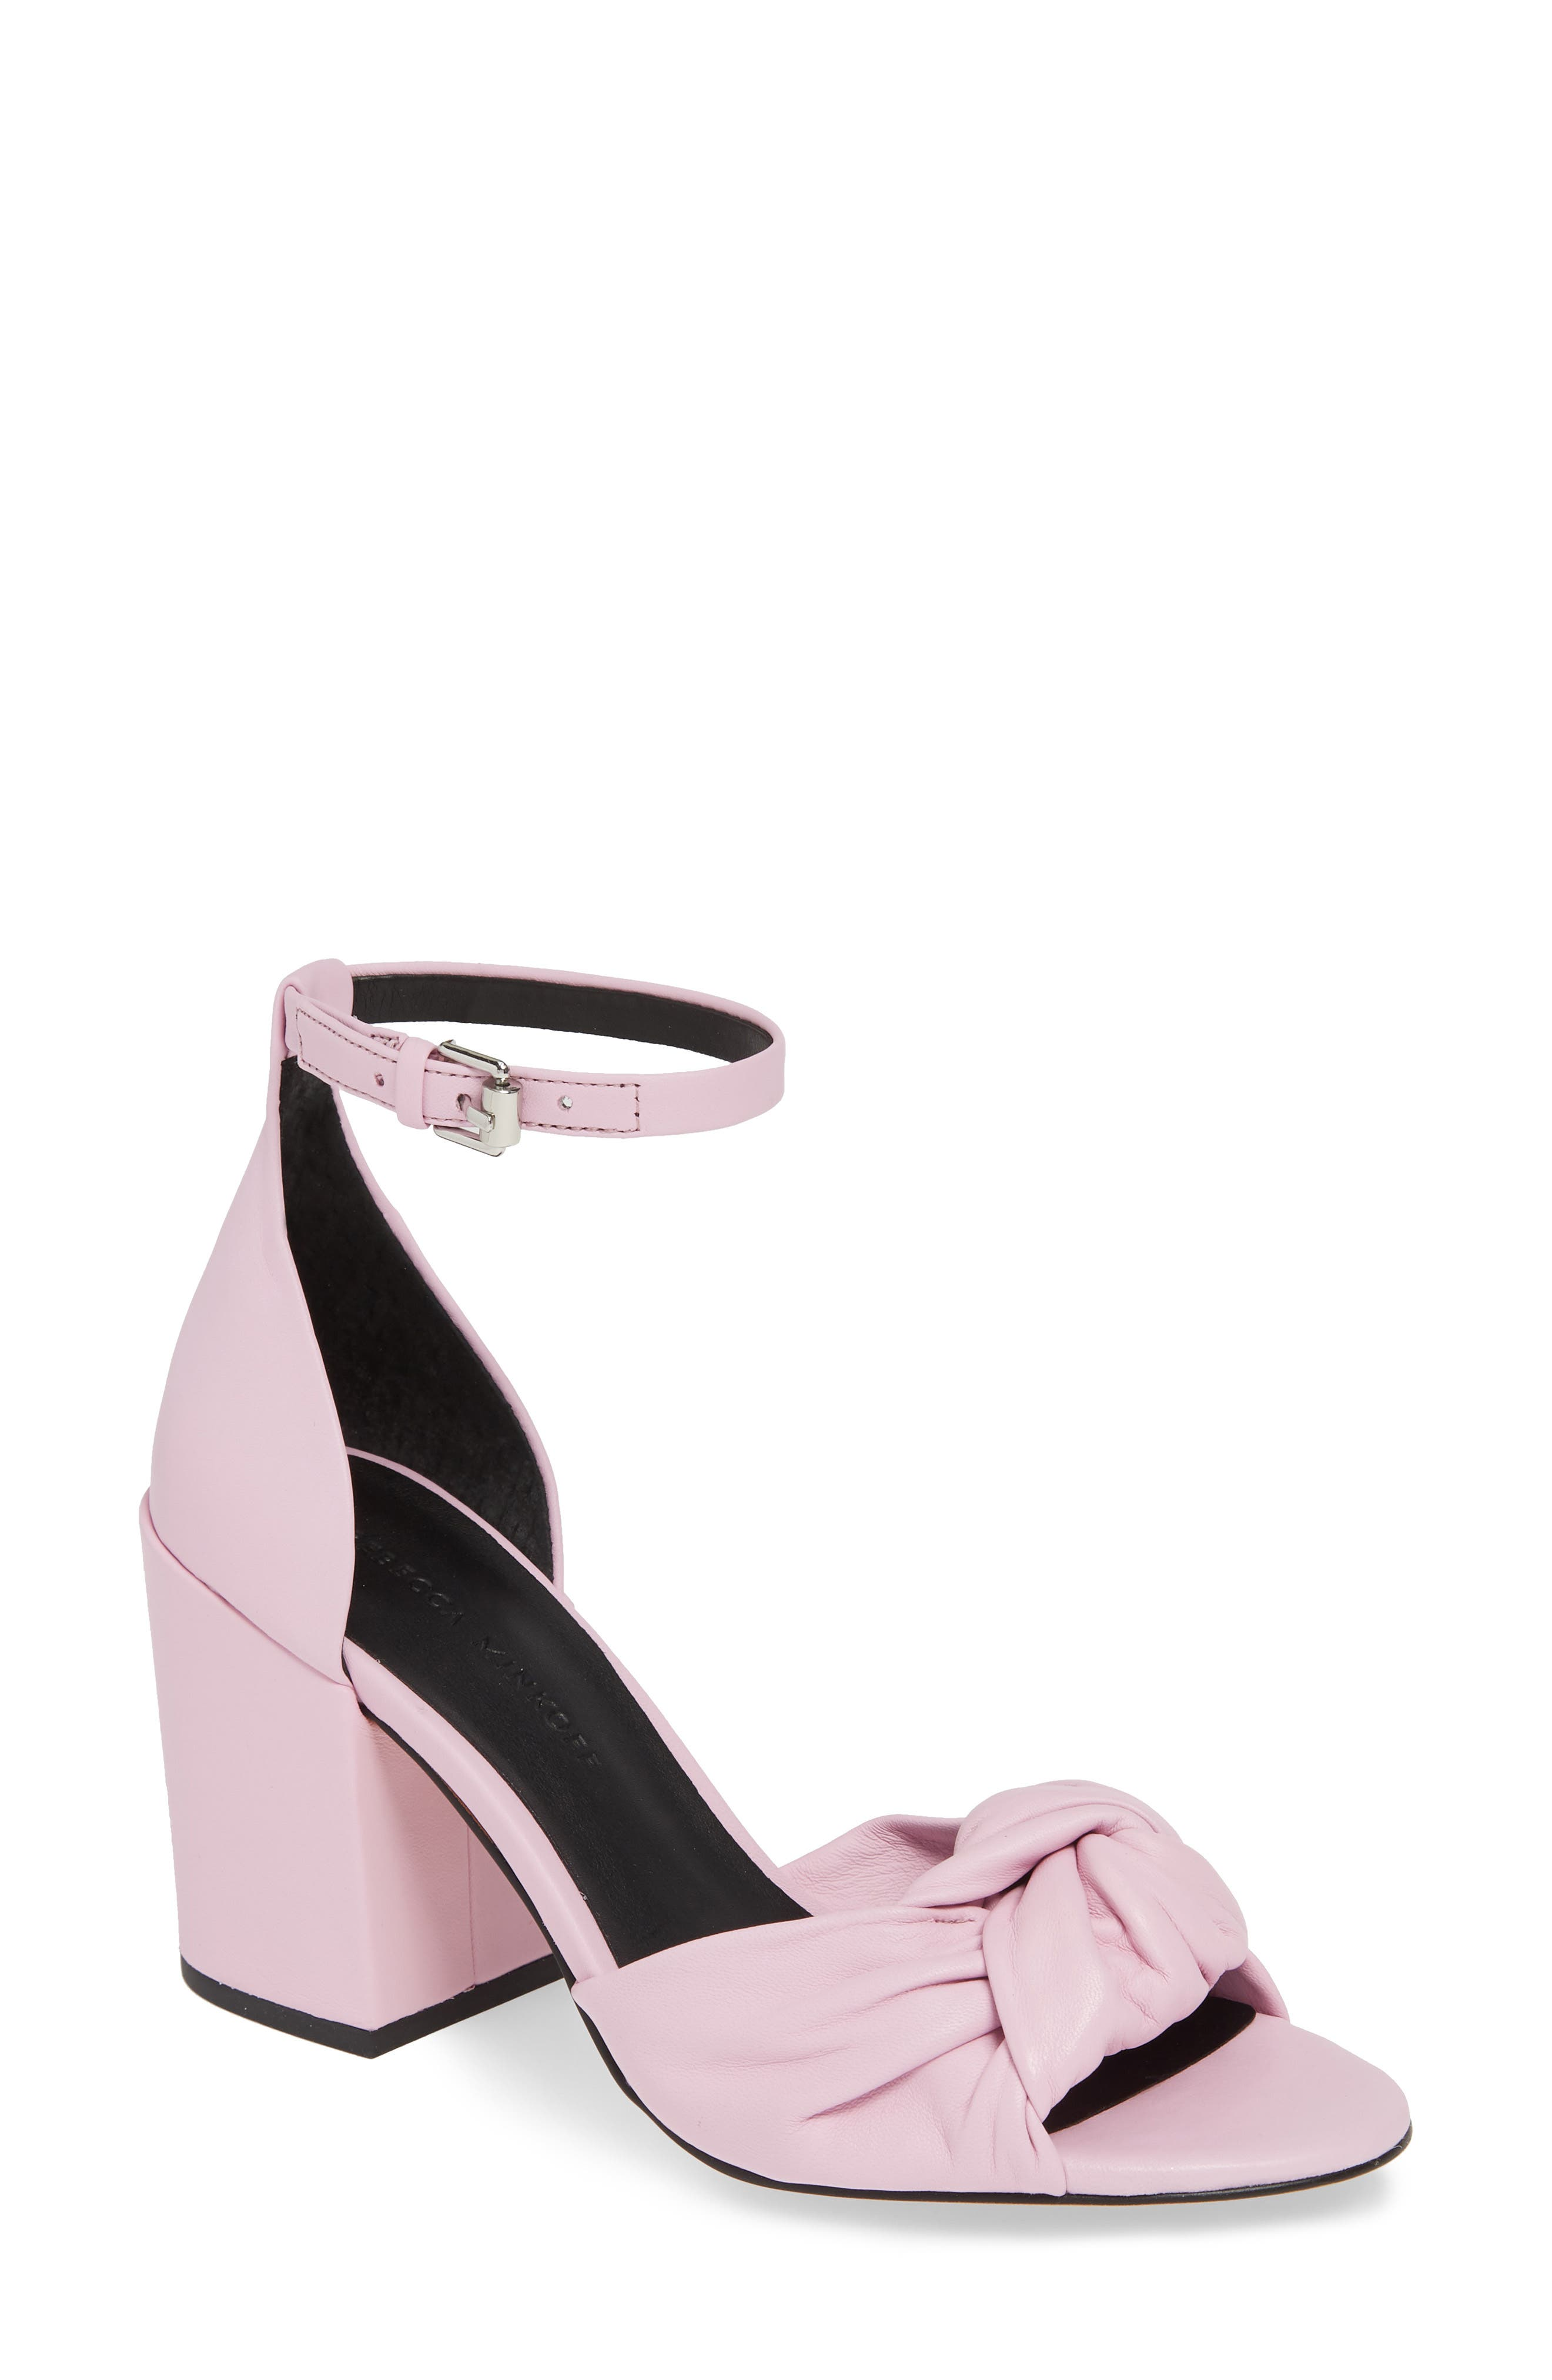 Rebecca Minkoff Capriana Ankle Strap Sandal, Pink